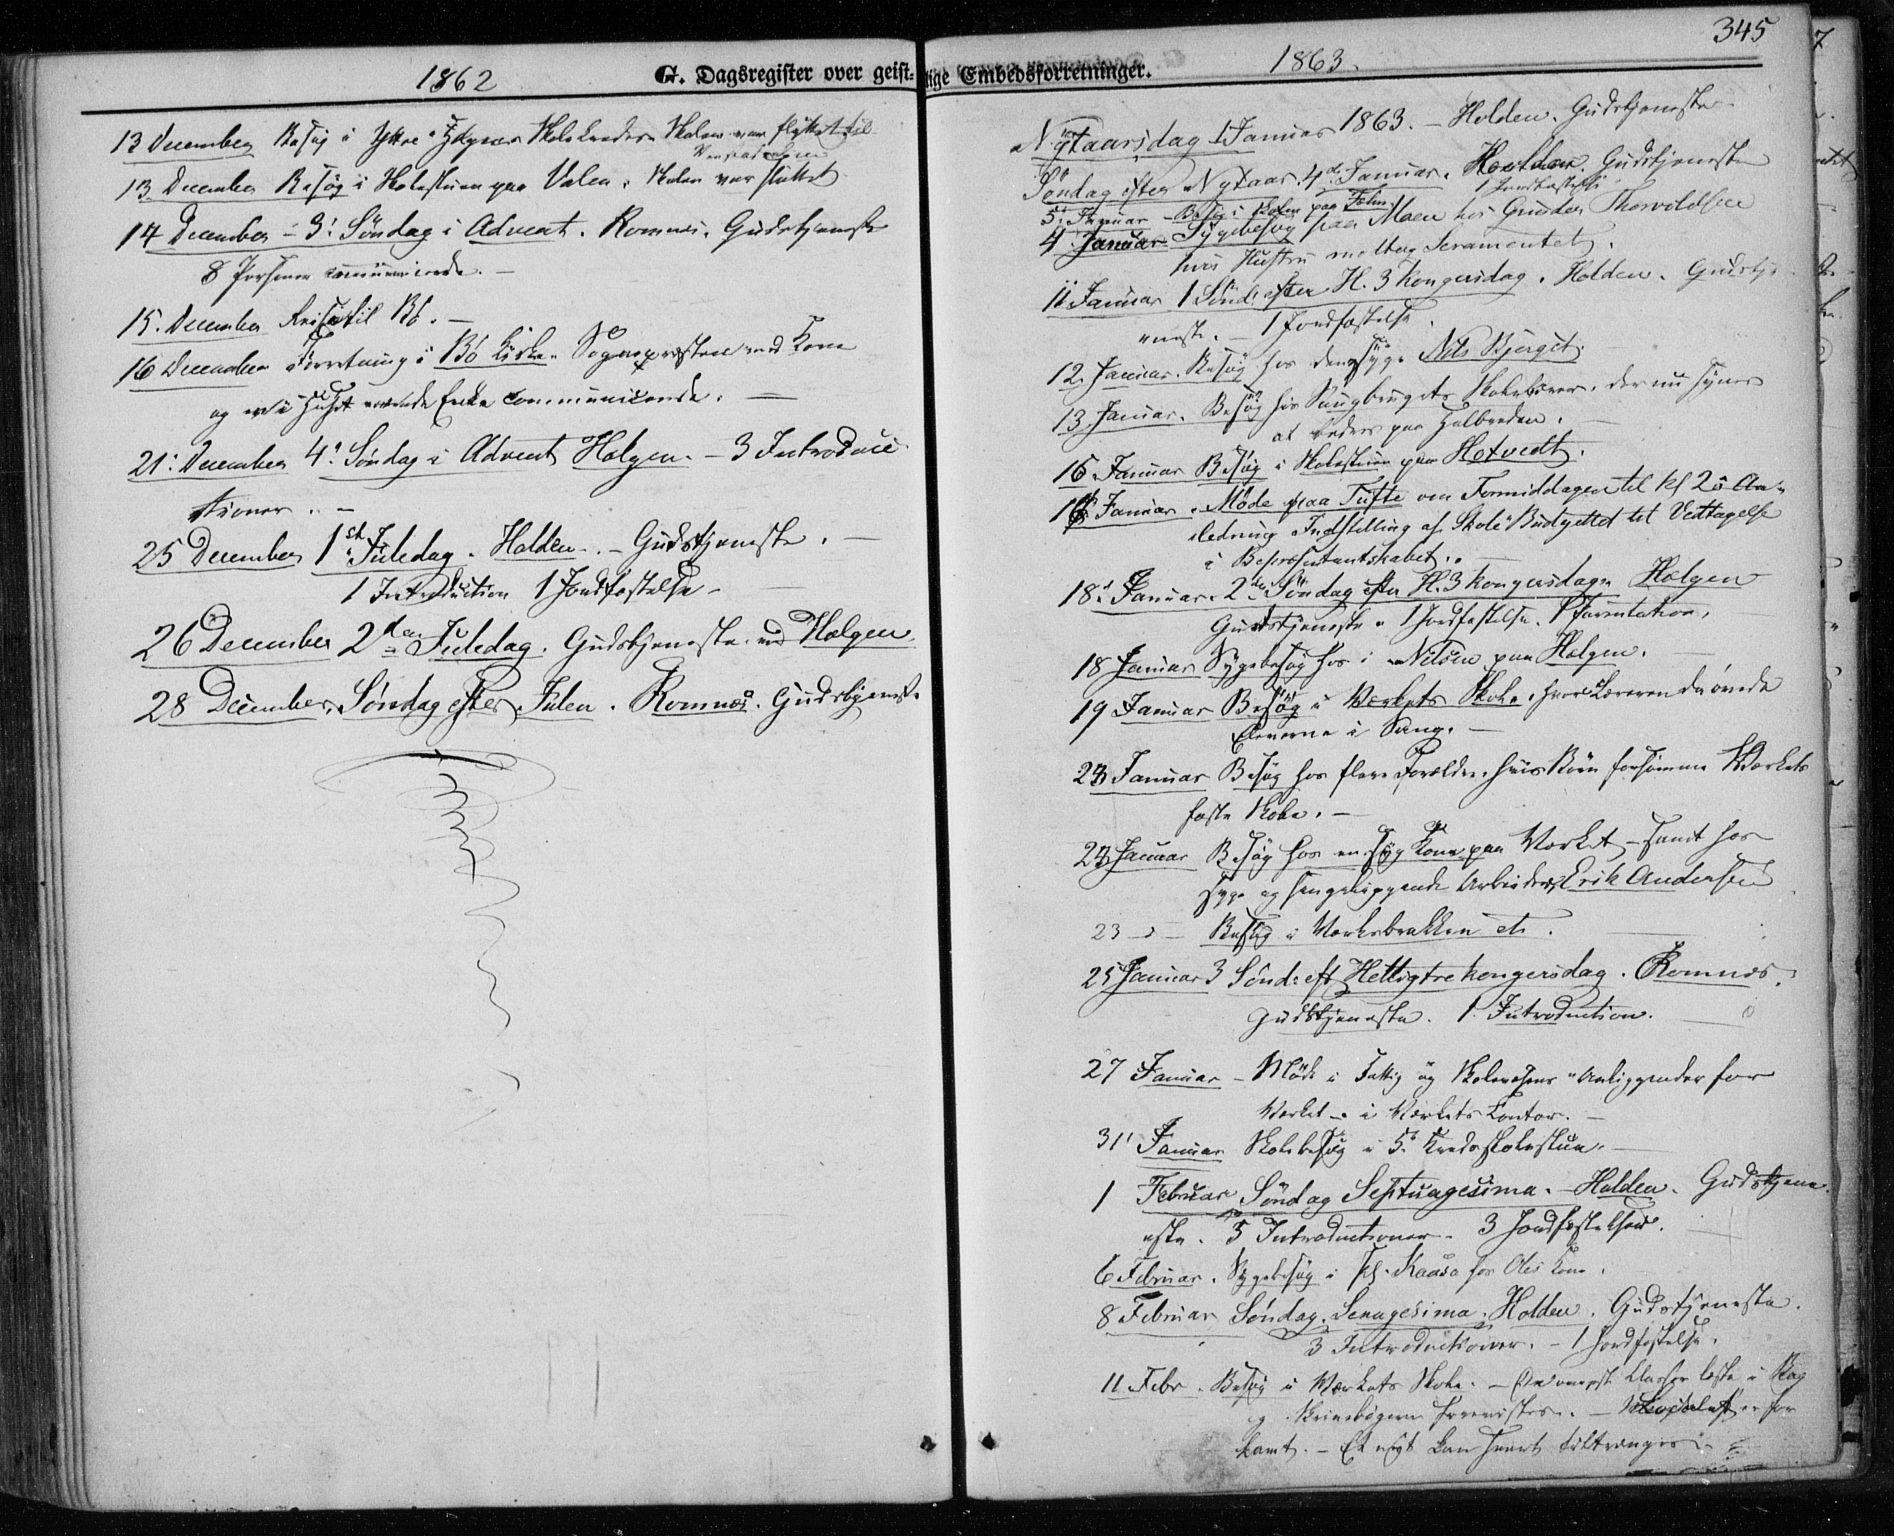 SAKO, Holla kirkebøker, F/Fa/L0006: Ministerialbok nr. 6, 1861-1869, s. 345